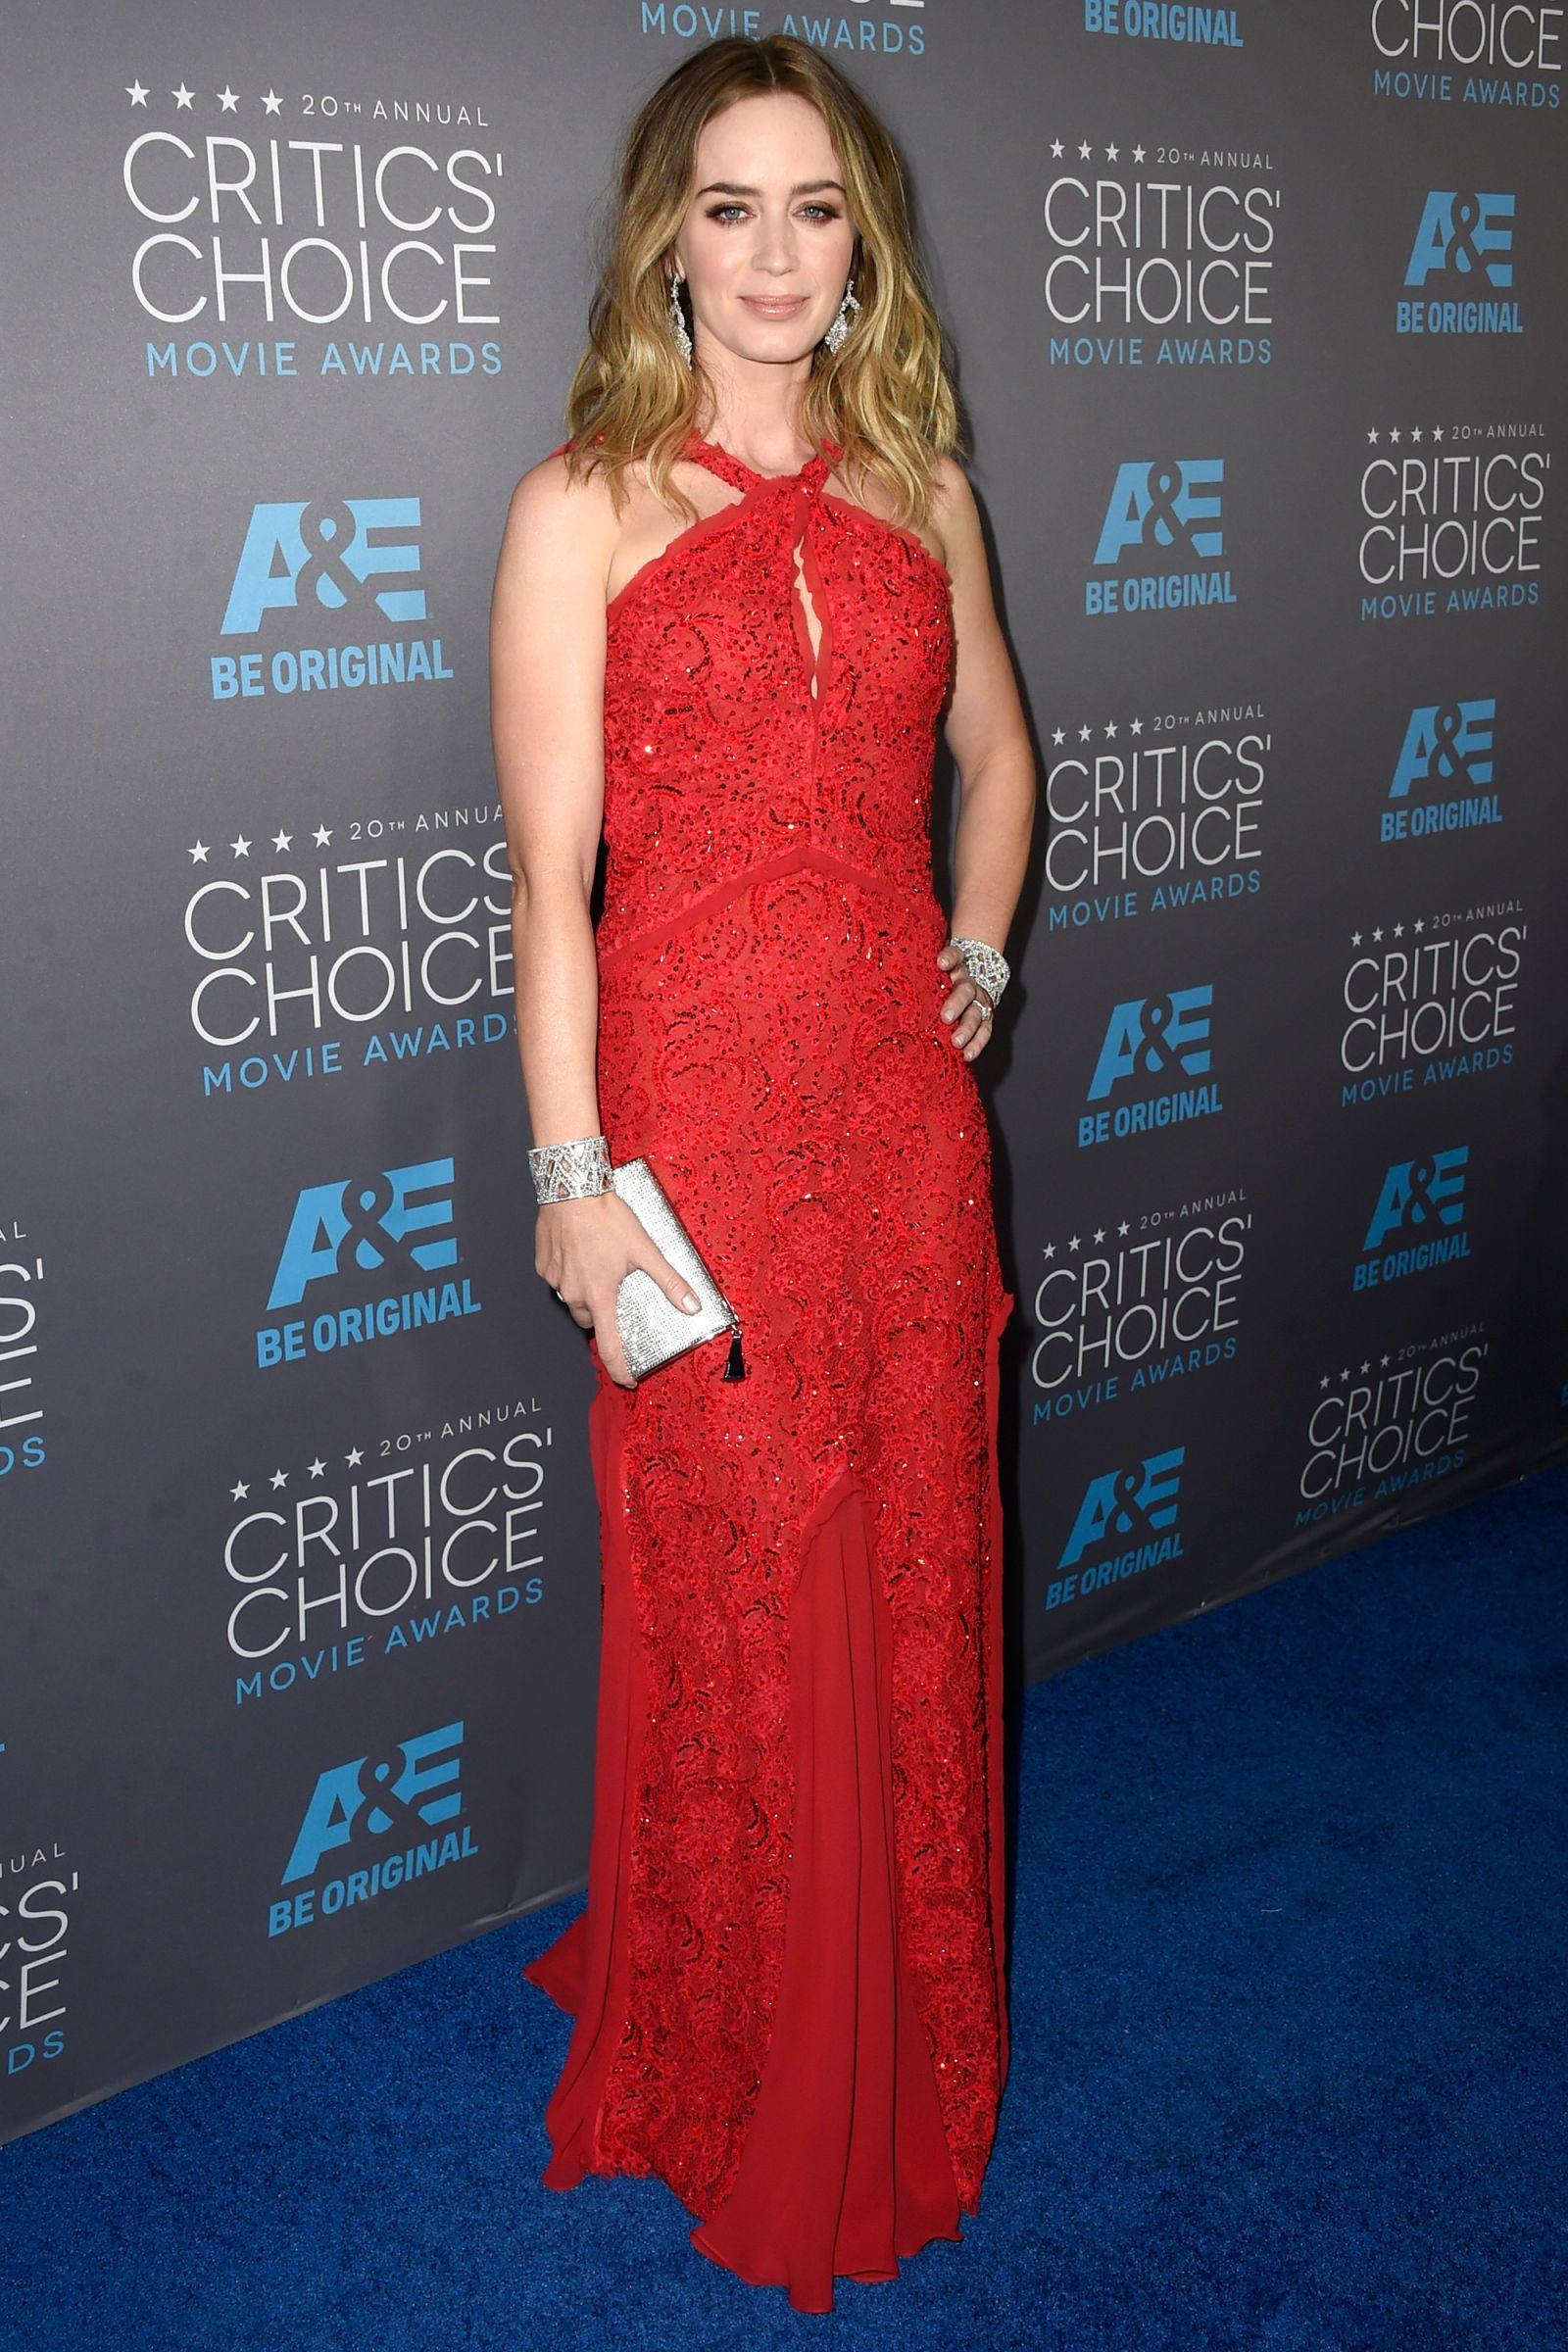 The Best of the Critics' Choice Awards 2015  - HarpersBAZAAR.com